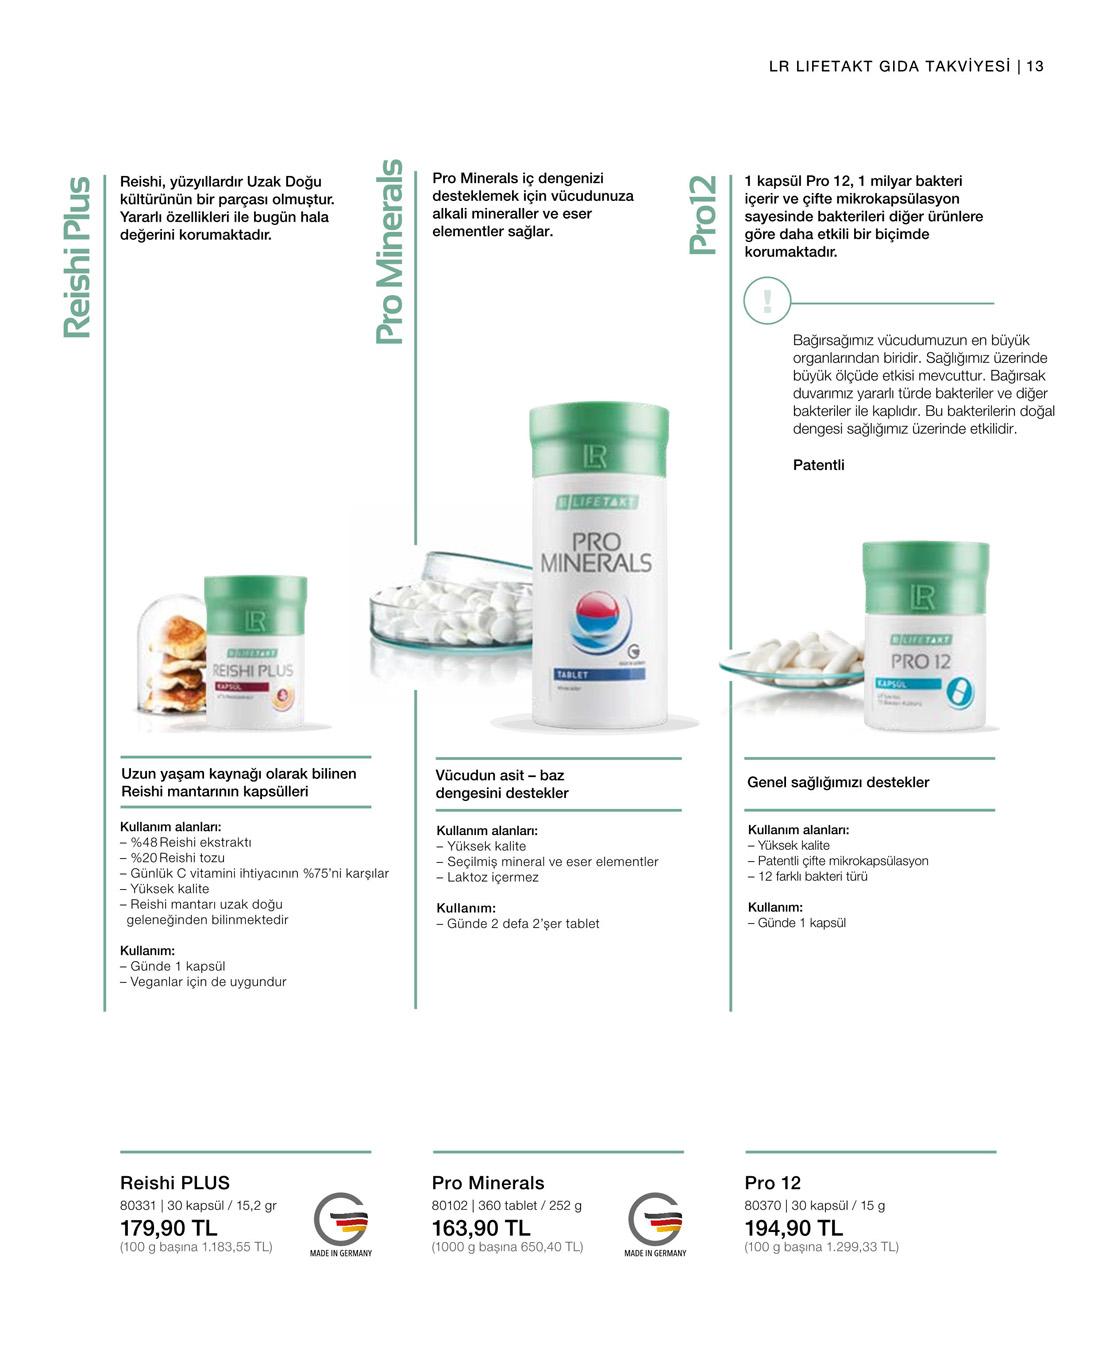 LR Pro Minerals (ProBalance) katalog